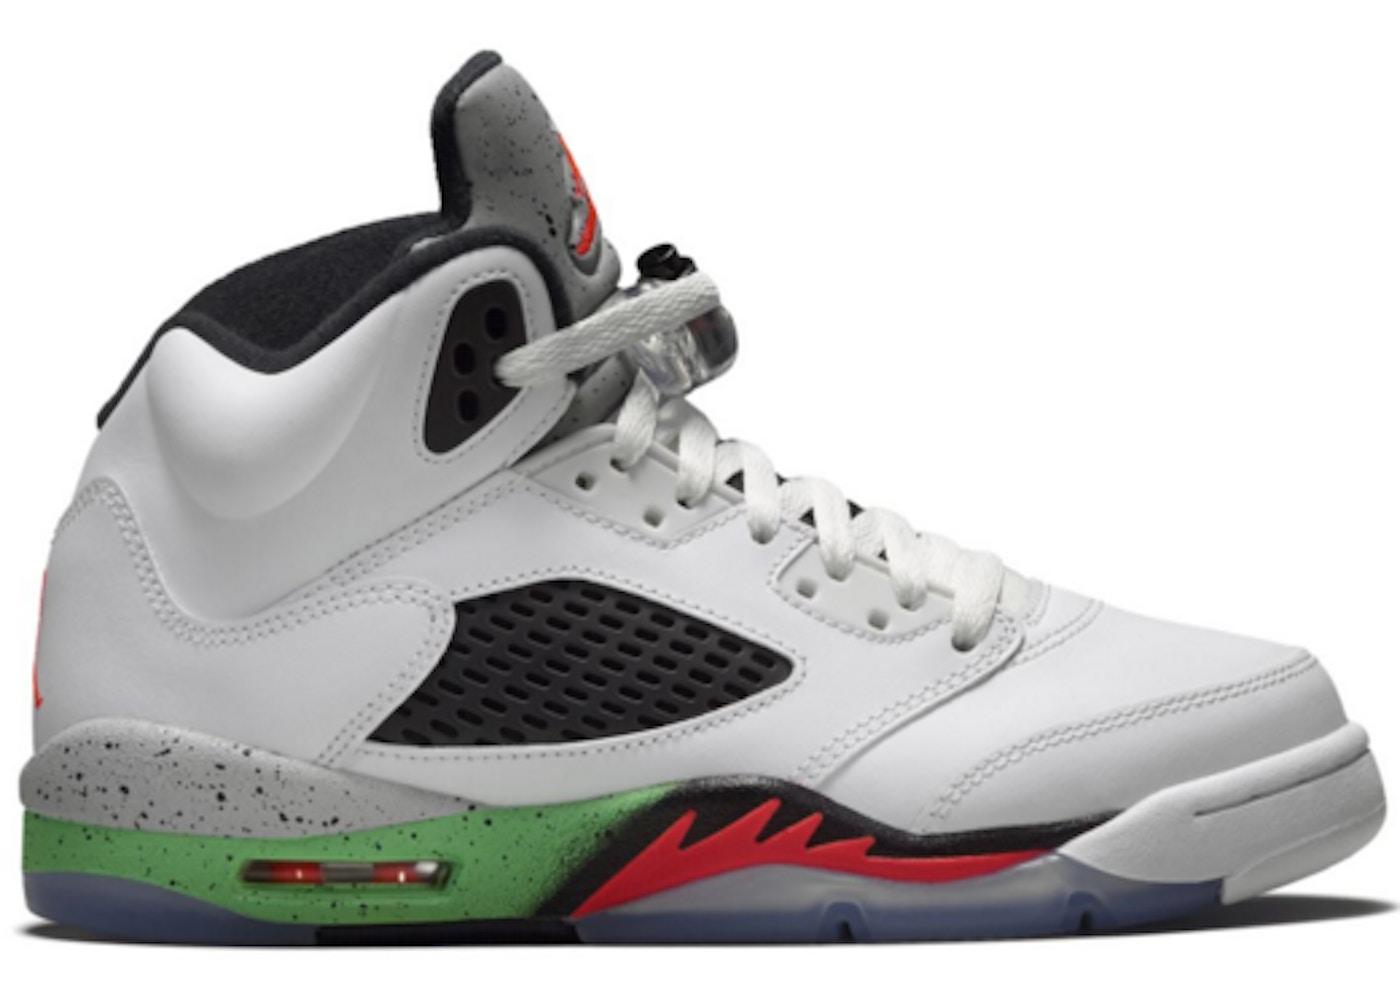 82e593295c7dc5 Jordan 5 Retro Poison Green (GS) - 440888-115